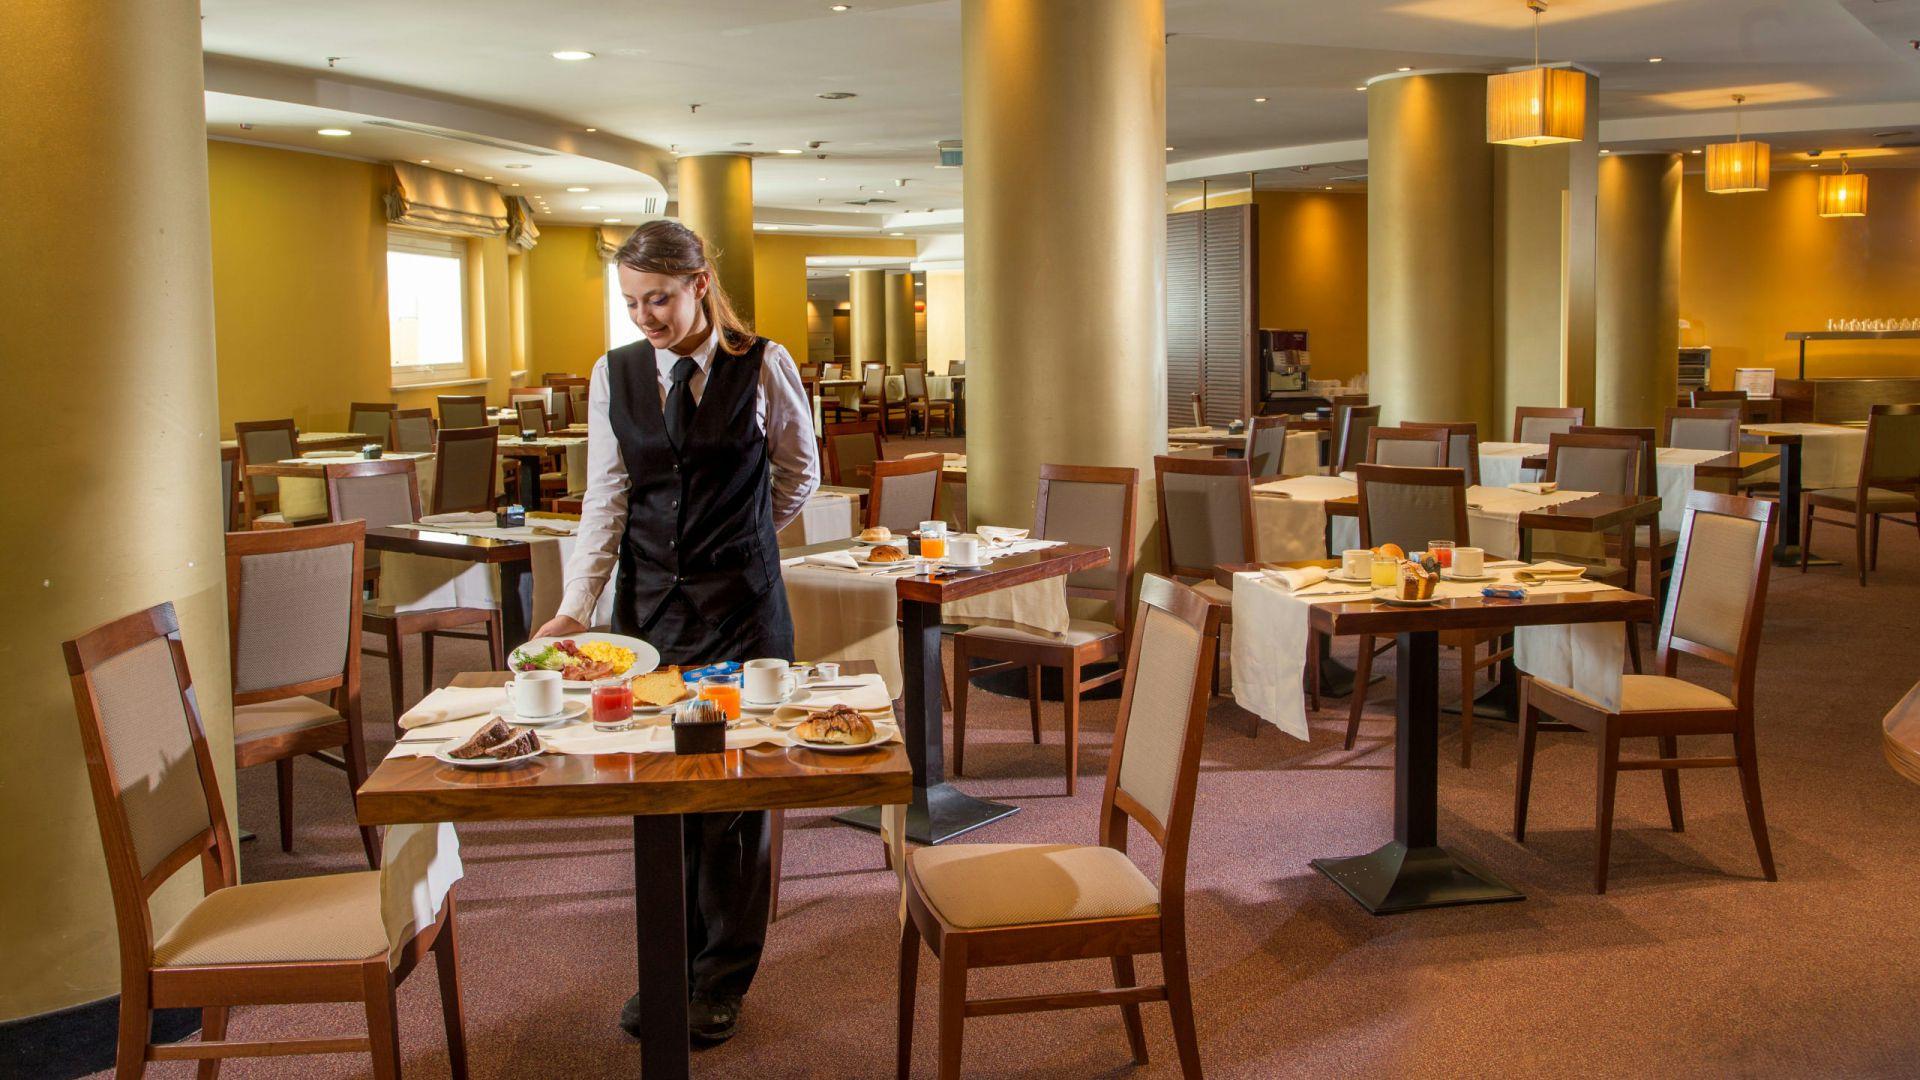 hotel-capannelle-rome-commonareas-08